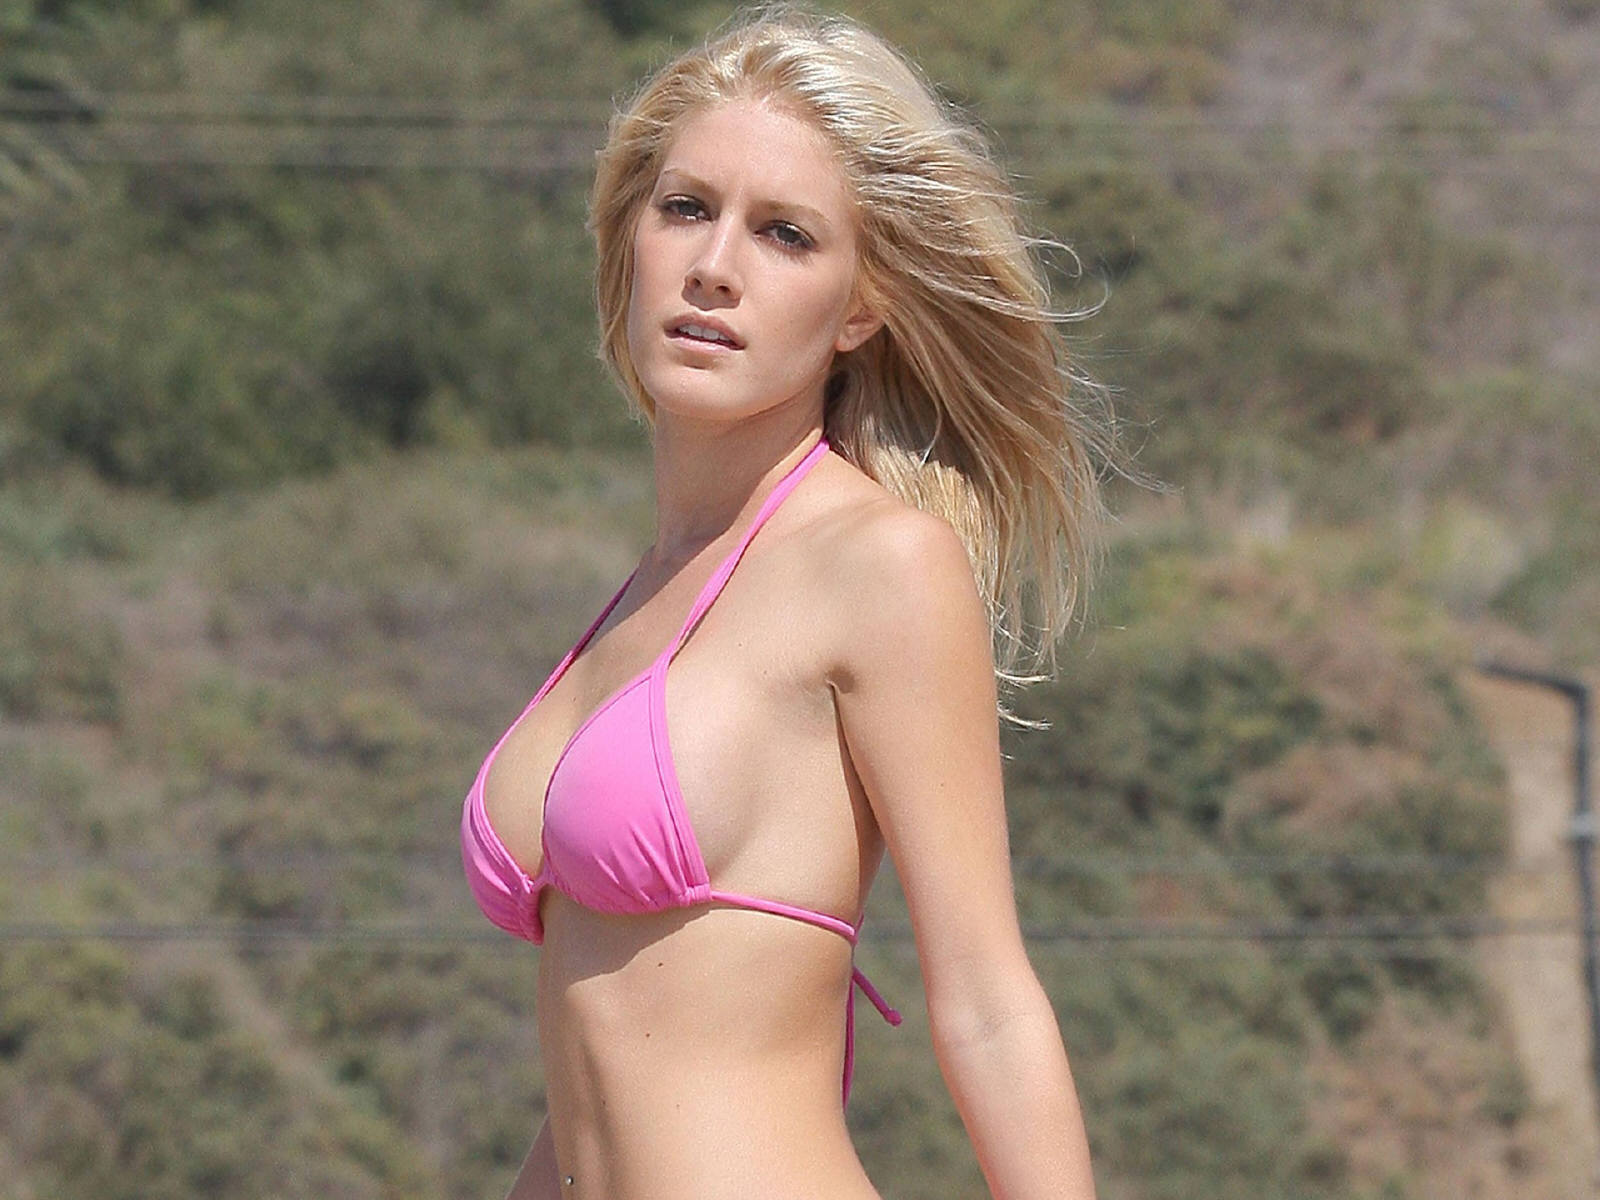 http://4.bp.blogspot.com/-3rPqMhQc5Js/TjGuteKf7mI/AAAAAAAAAIY/ryheYCkNnC8/s1600/heidi-montag-bikini-1-03.jpg.jpg